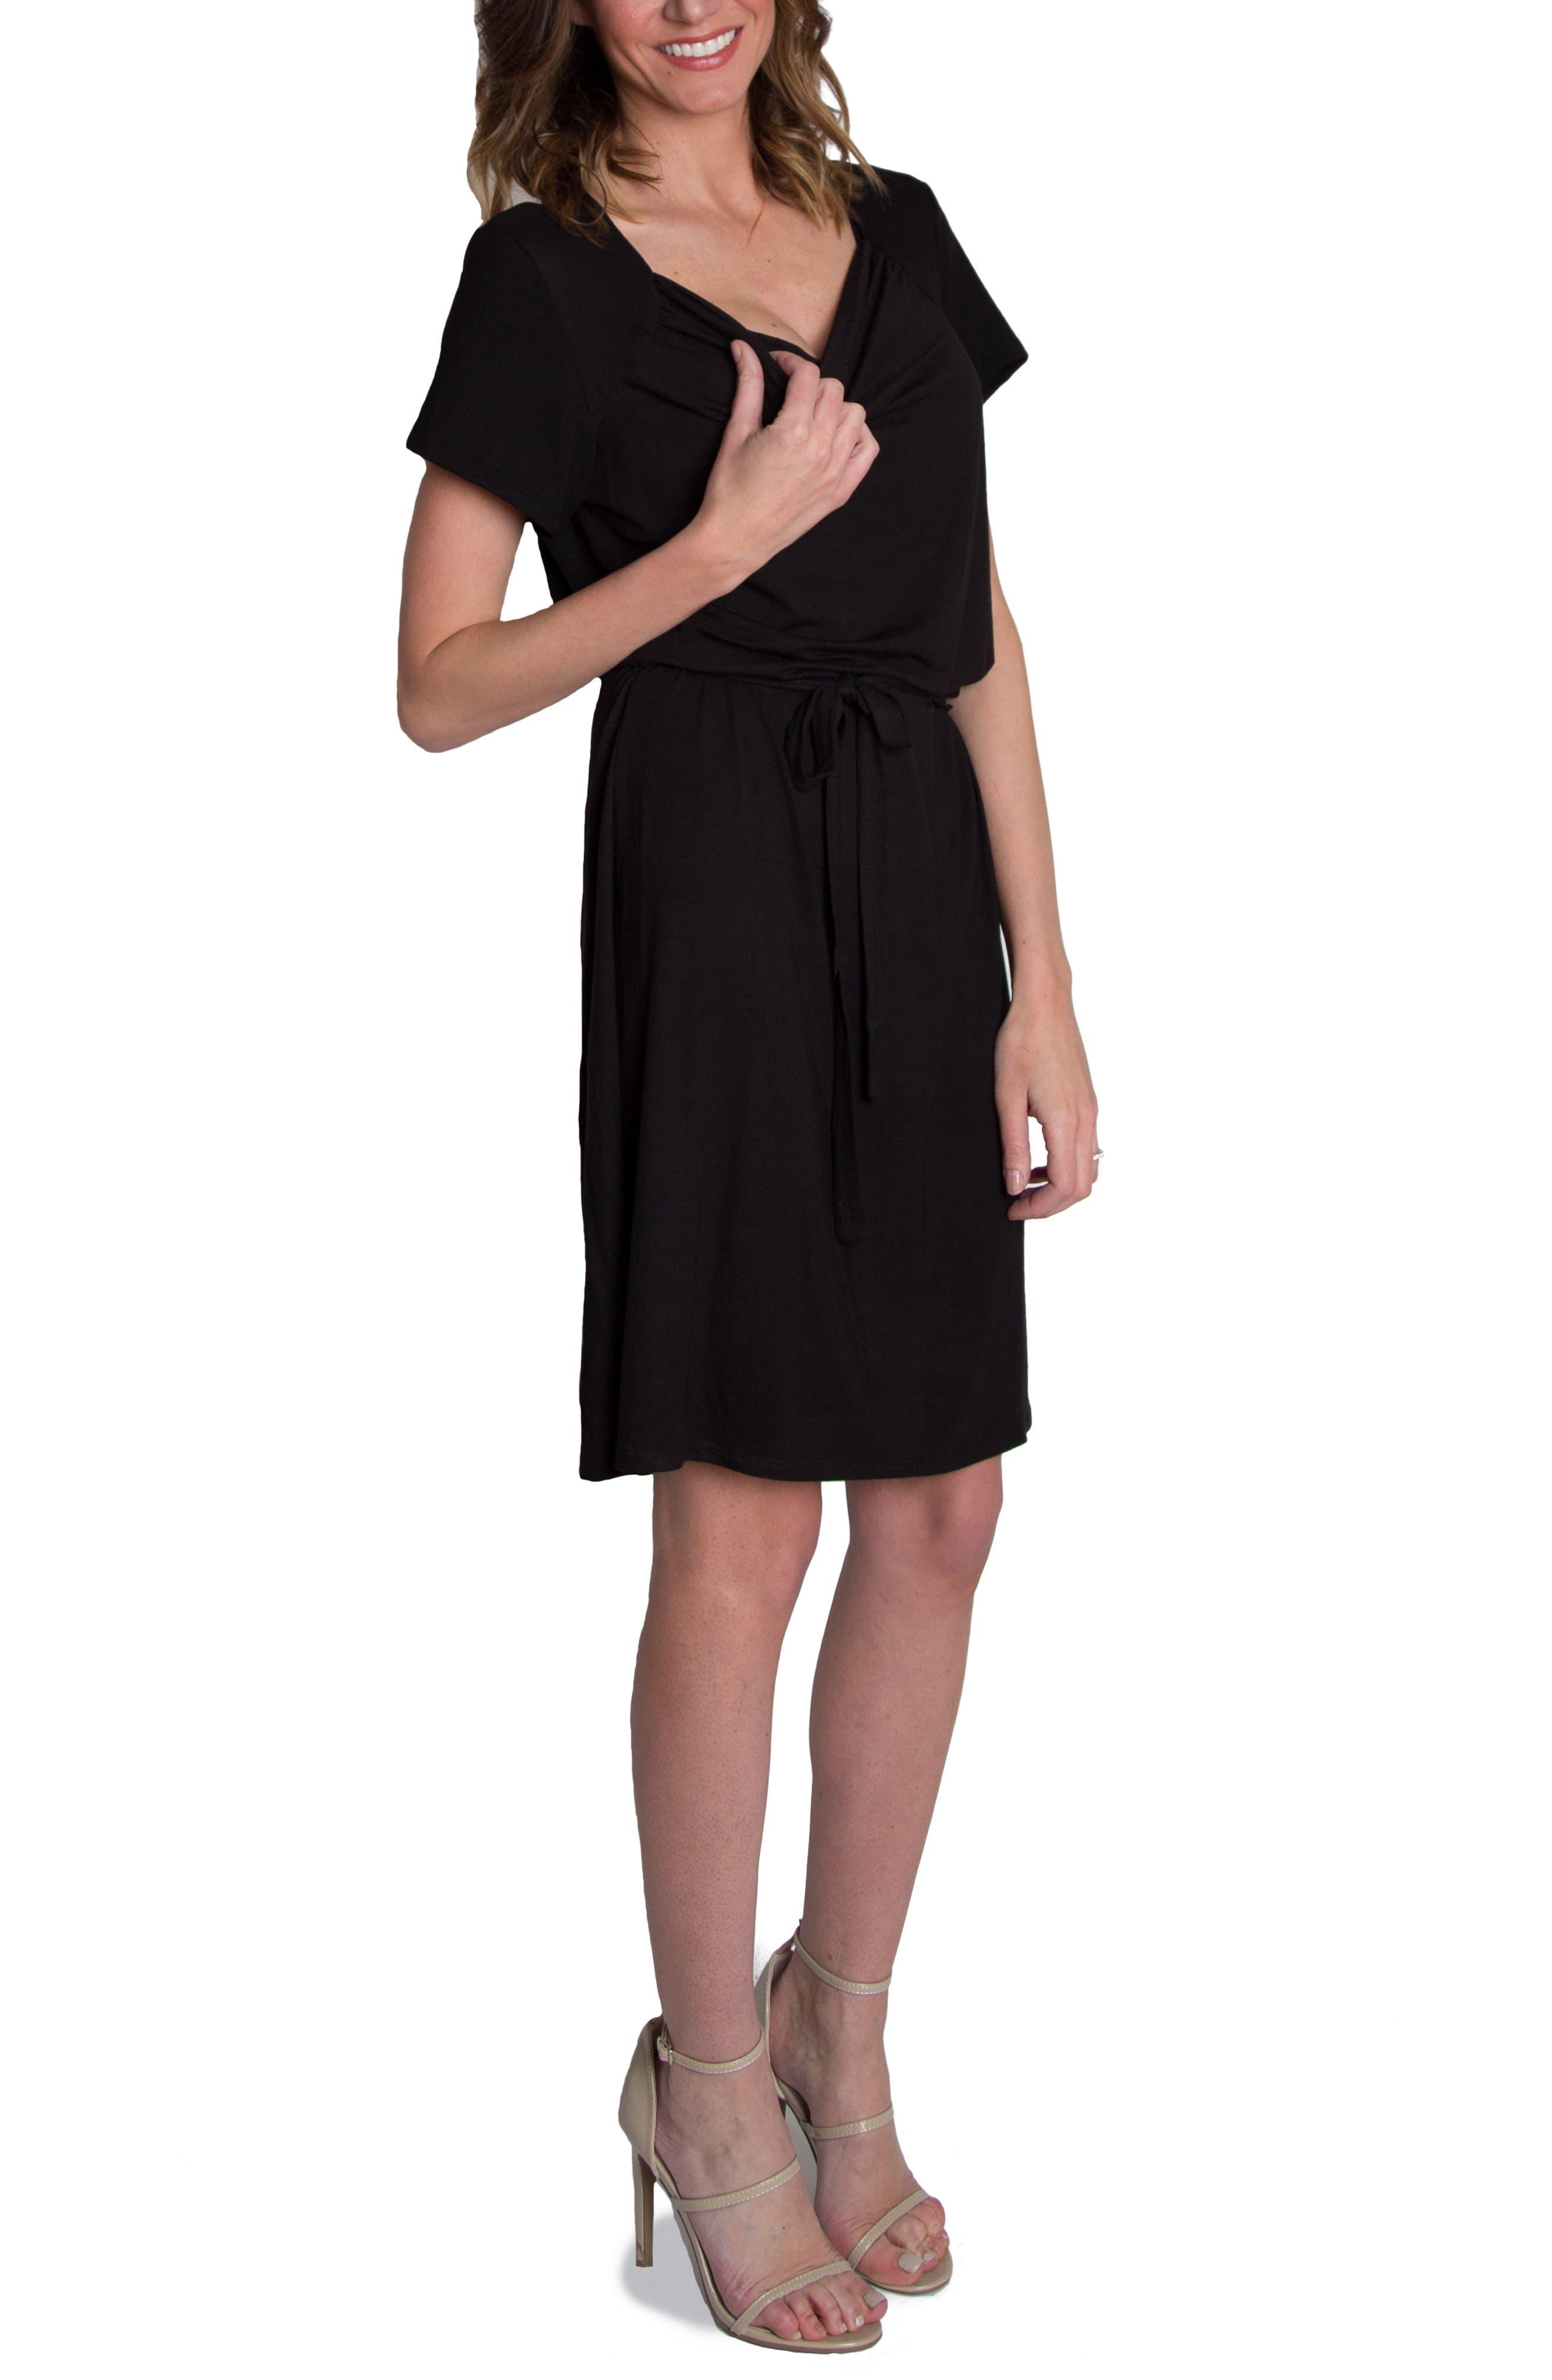 'Chic' Cowl Neck Nursing Dress,                             Alternate thumbnail 3, color,                             BLACK